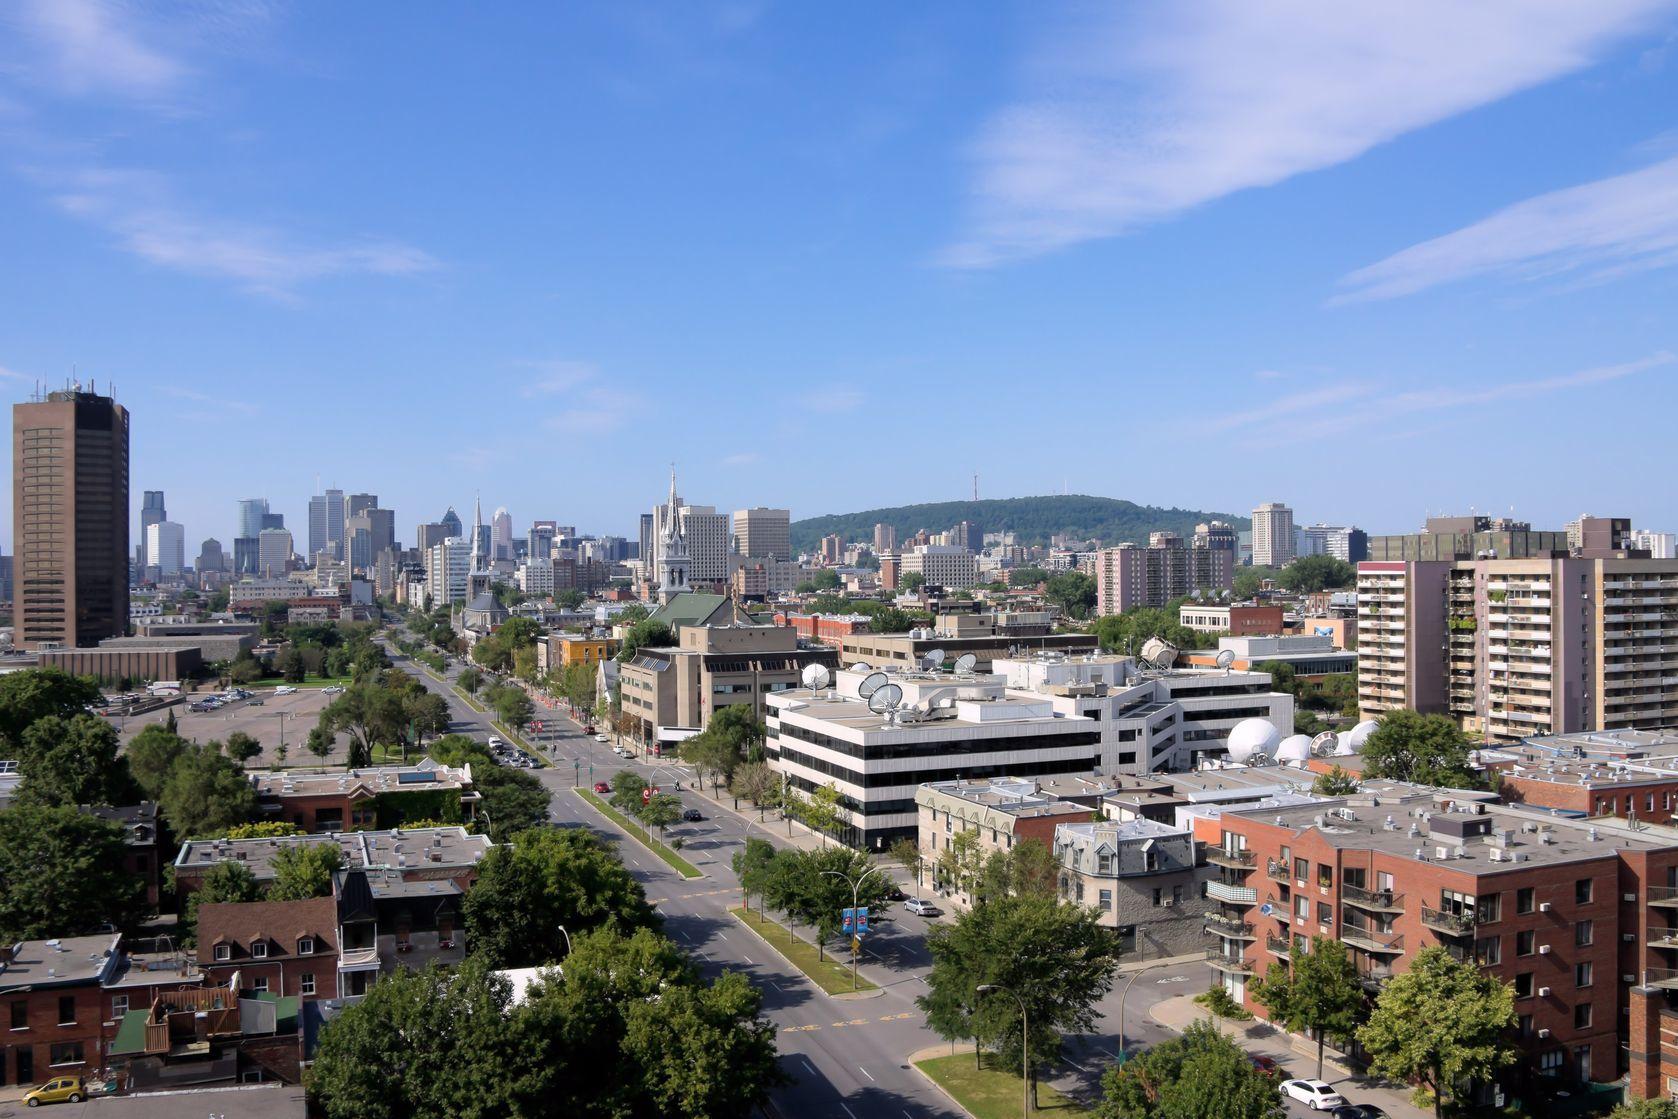 Ulice v kanadském Montreálu | denis0856/123RF.com